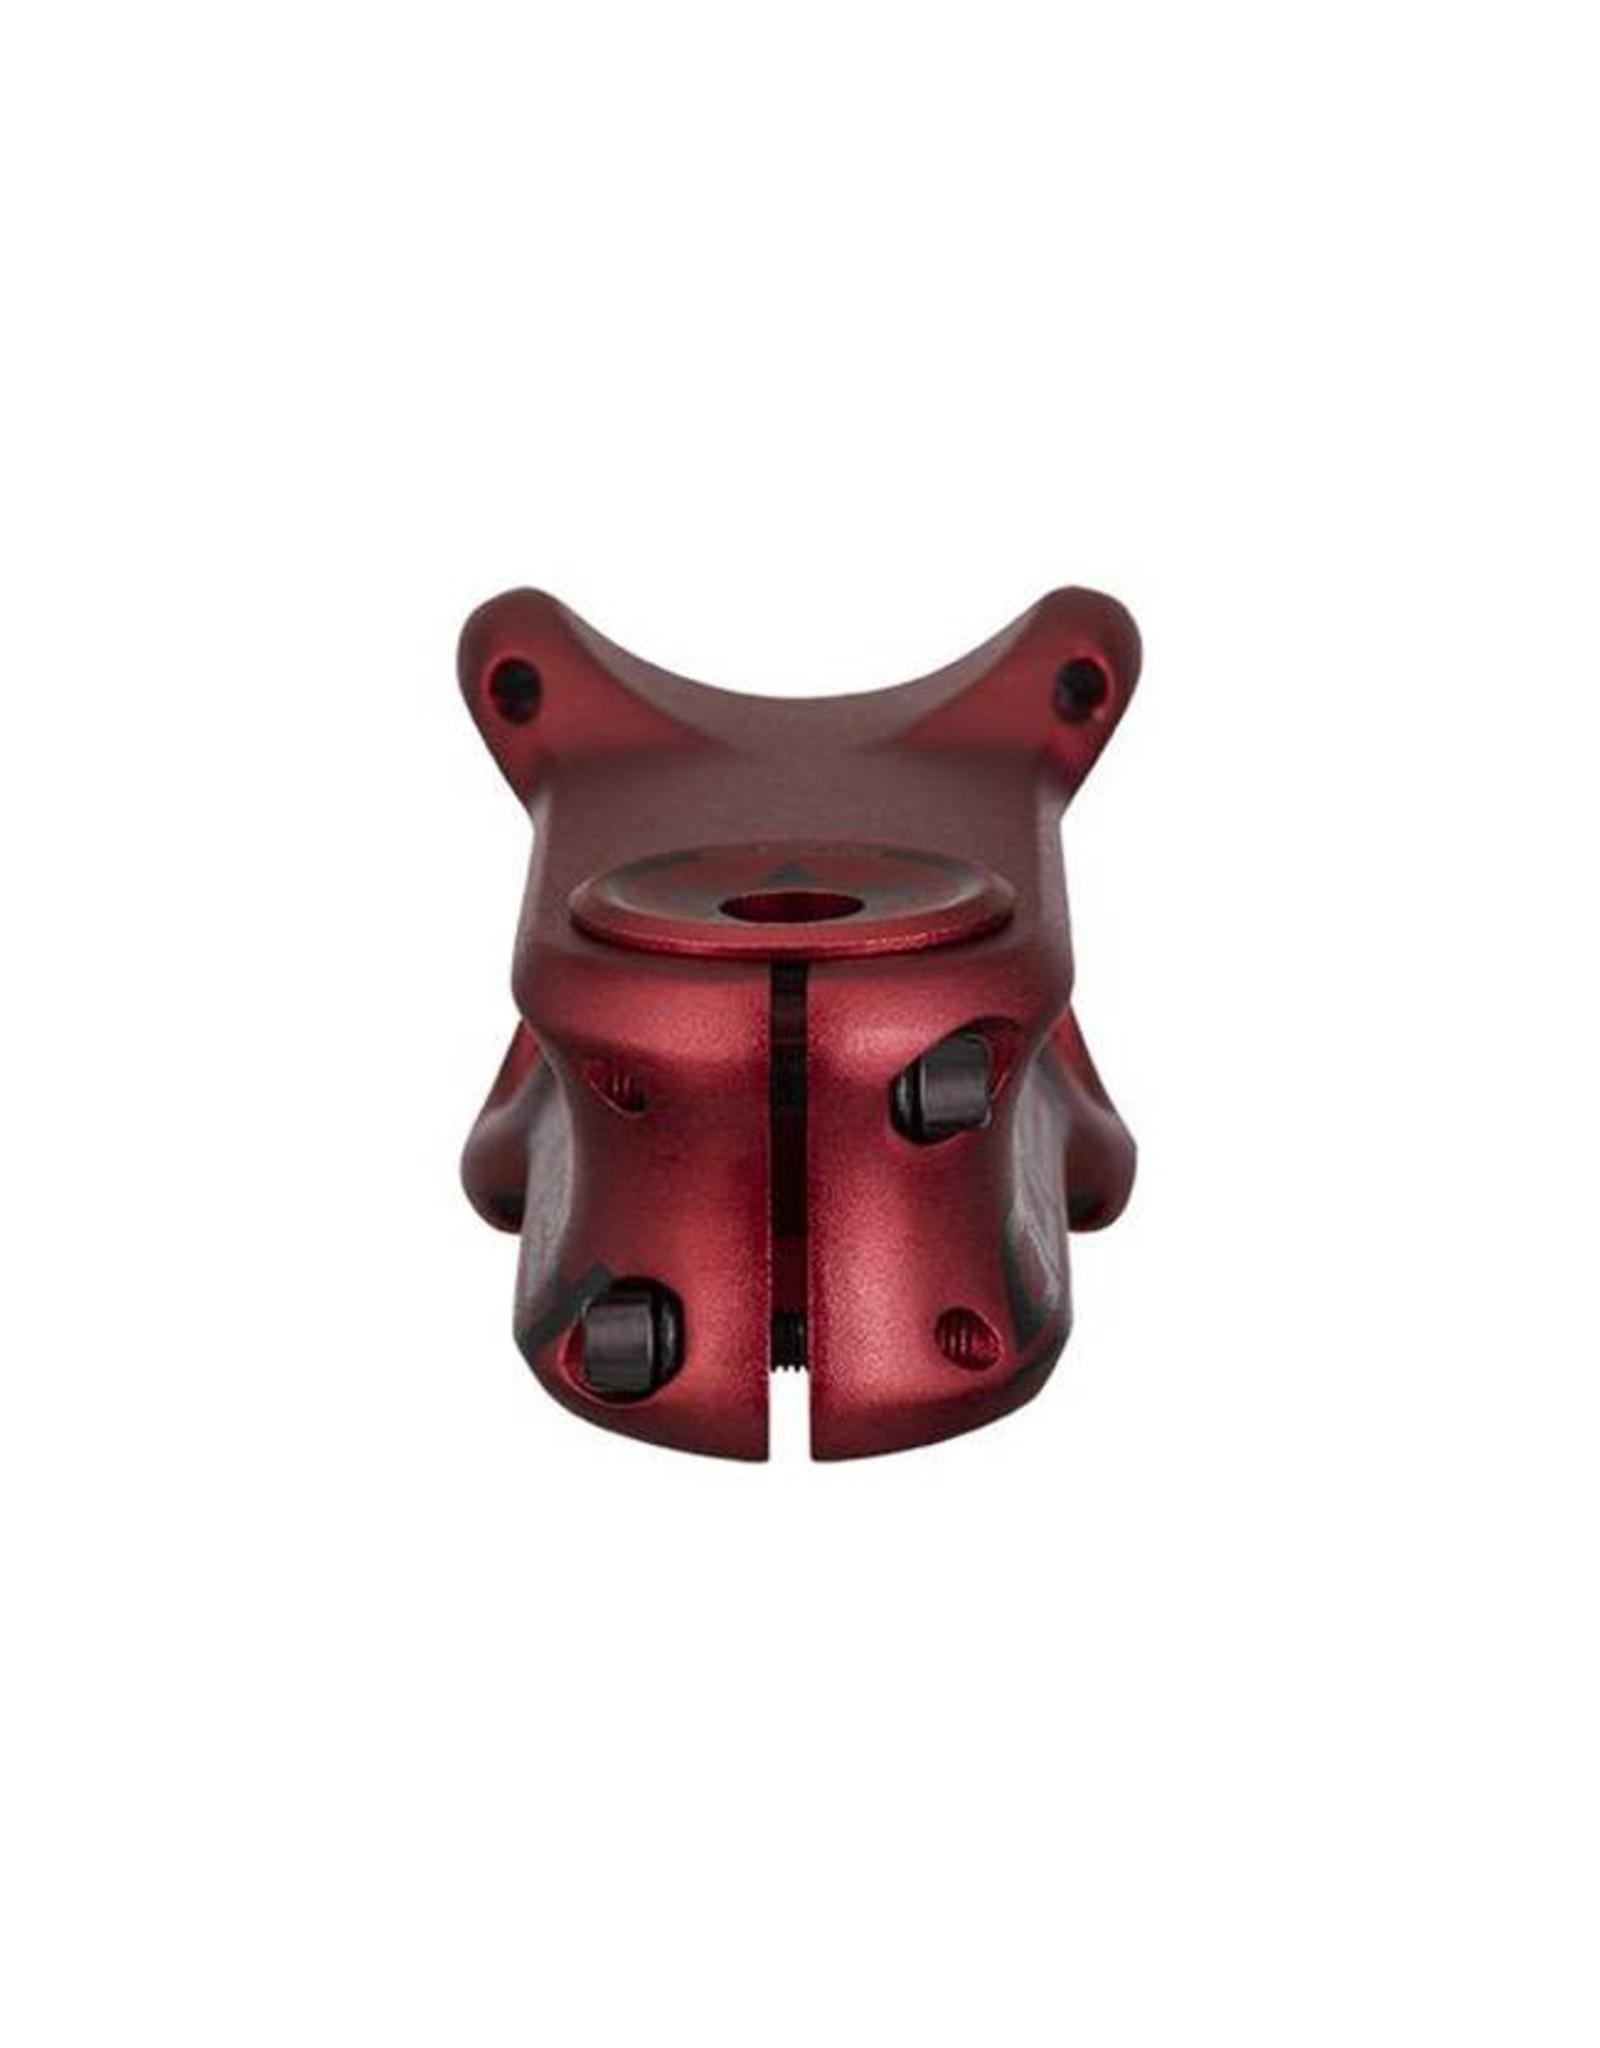 Spank Spank Oozy Trail Stem 50mm, 31.8, Matte Red